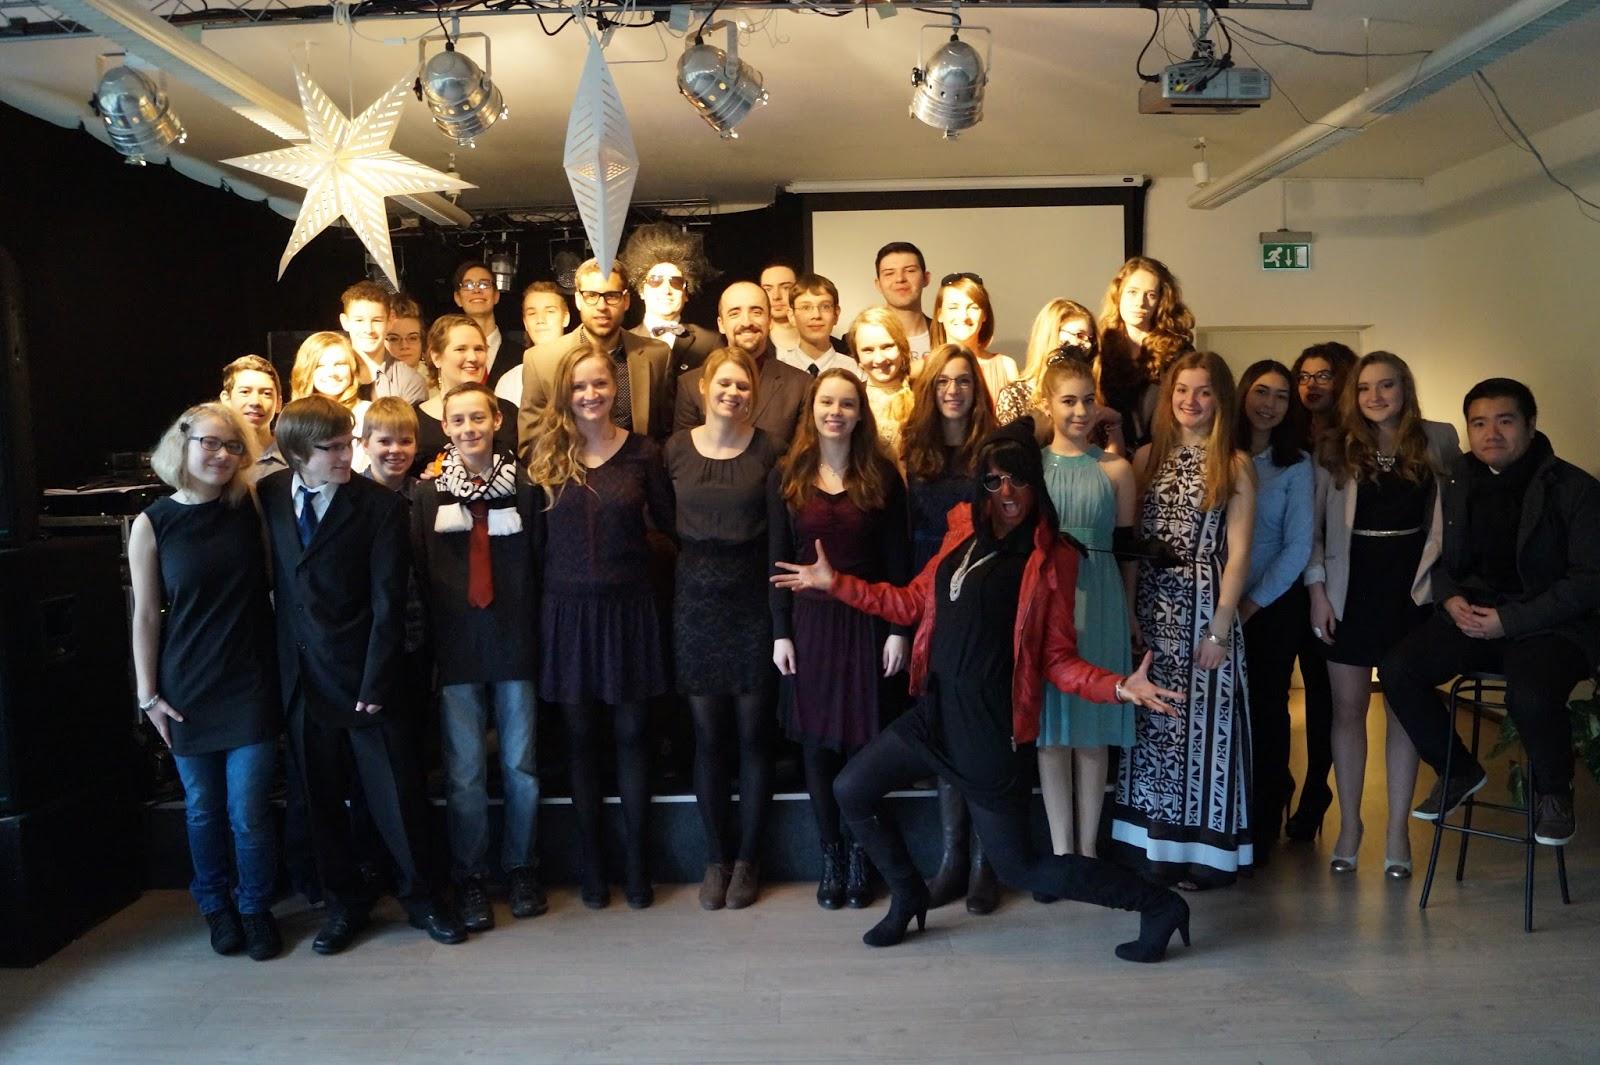 Teppich Mainz youth alive mainz neujahrsempfang motto roter teppich